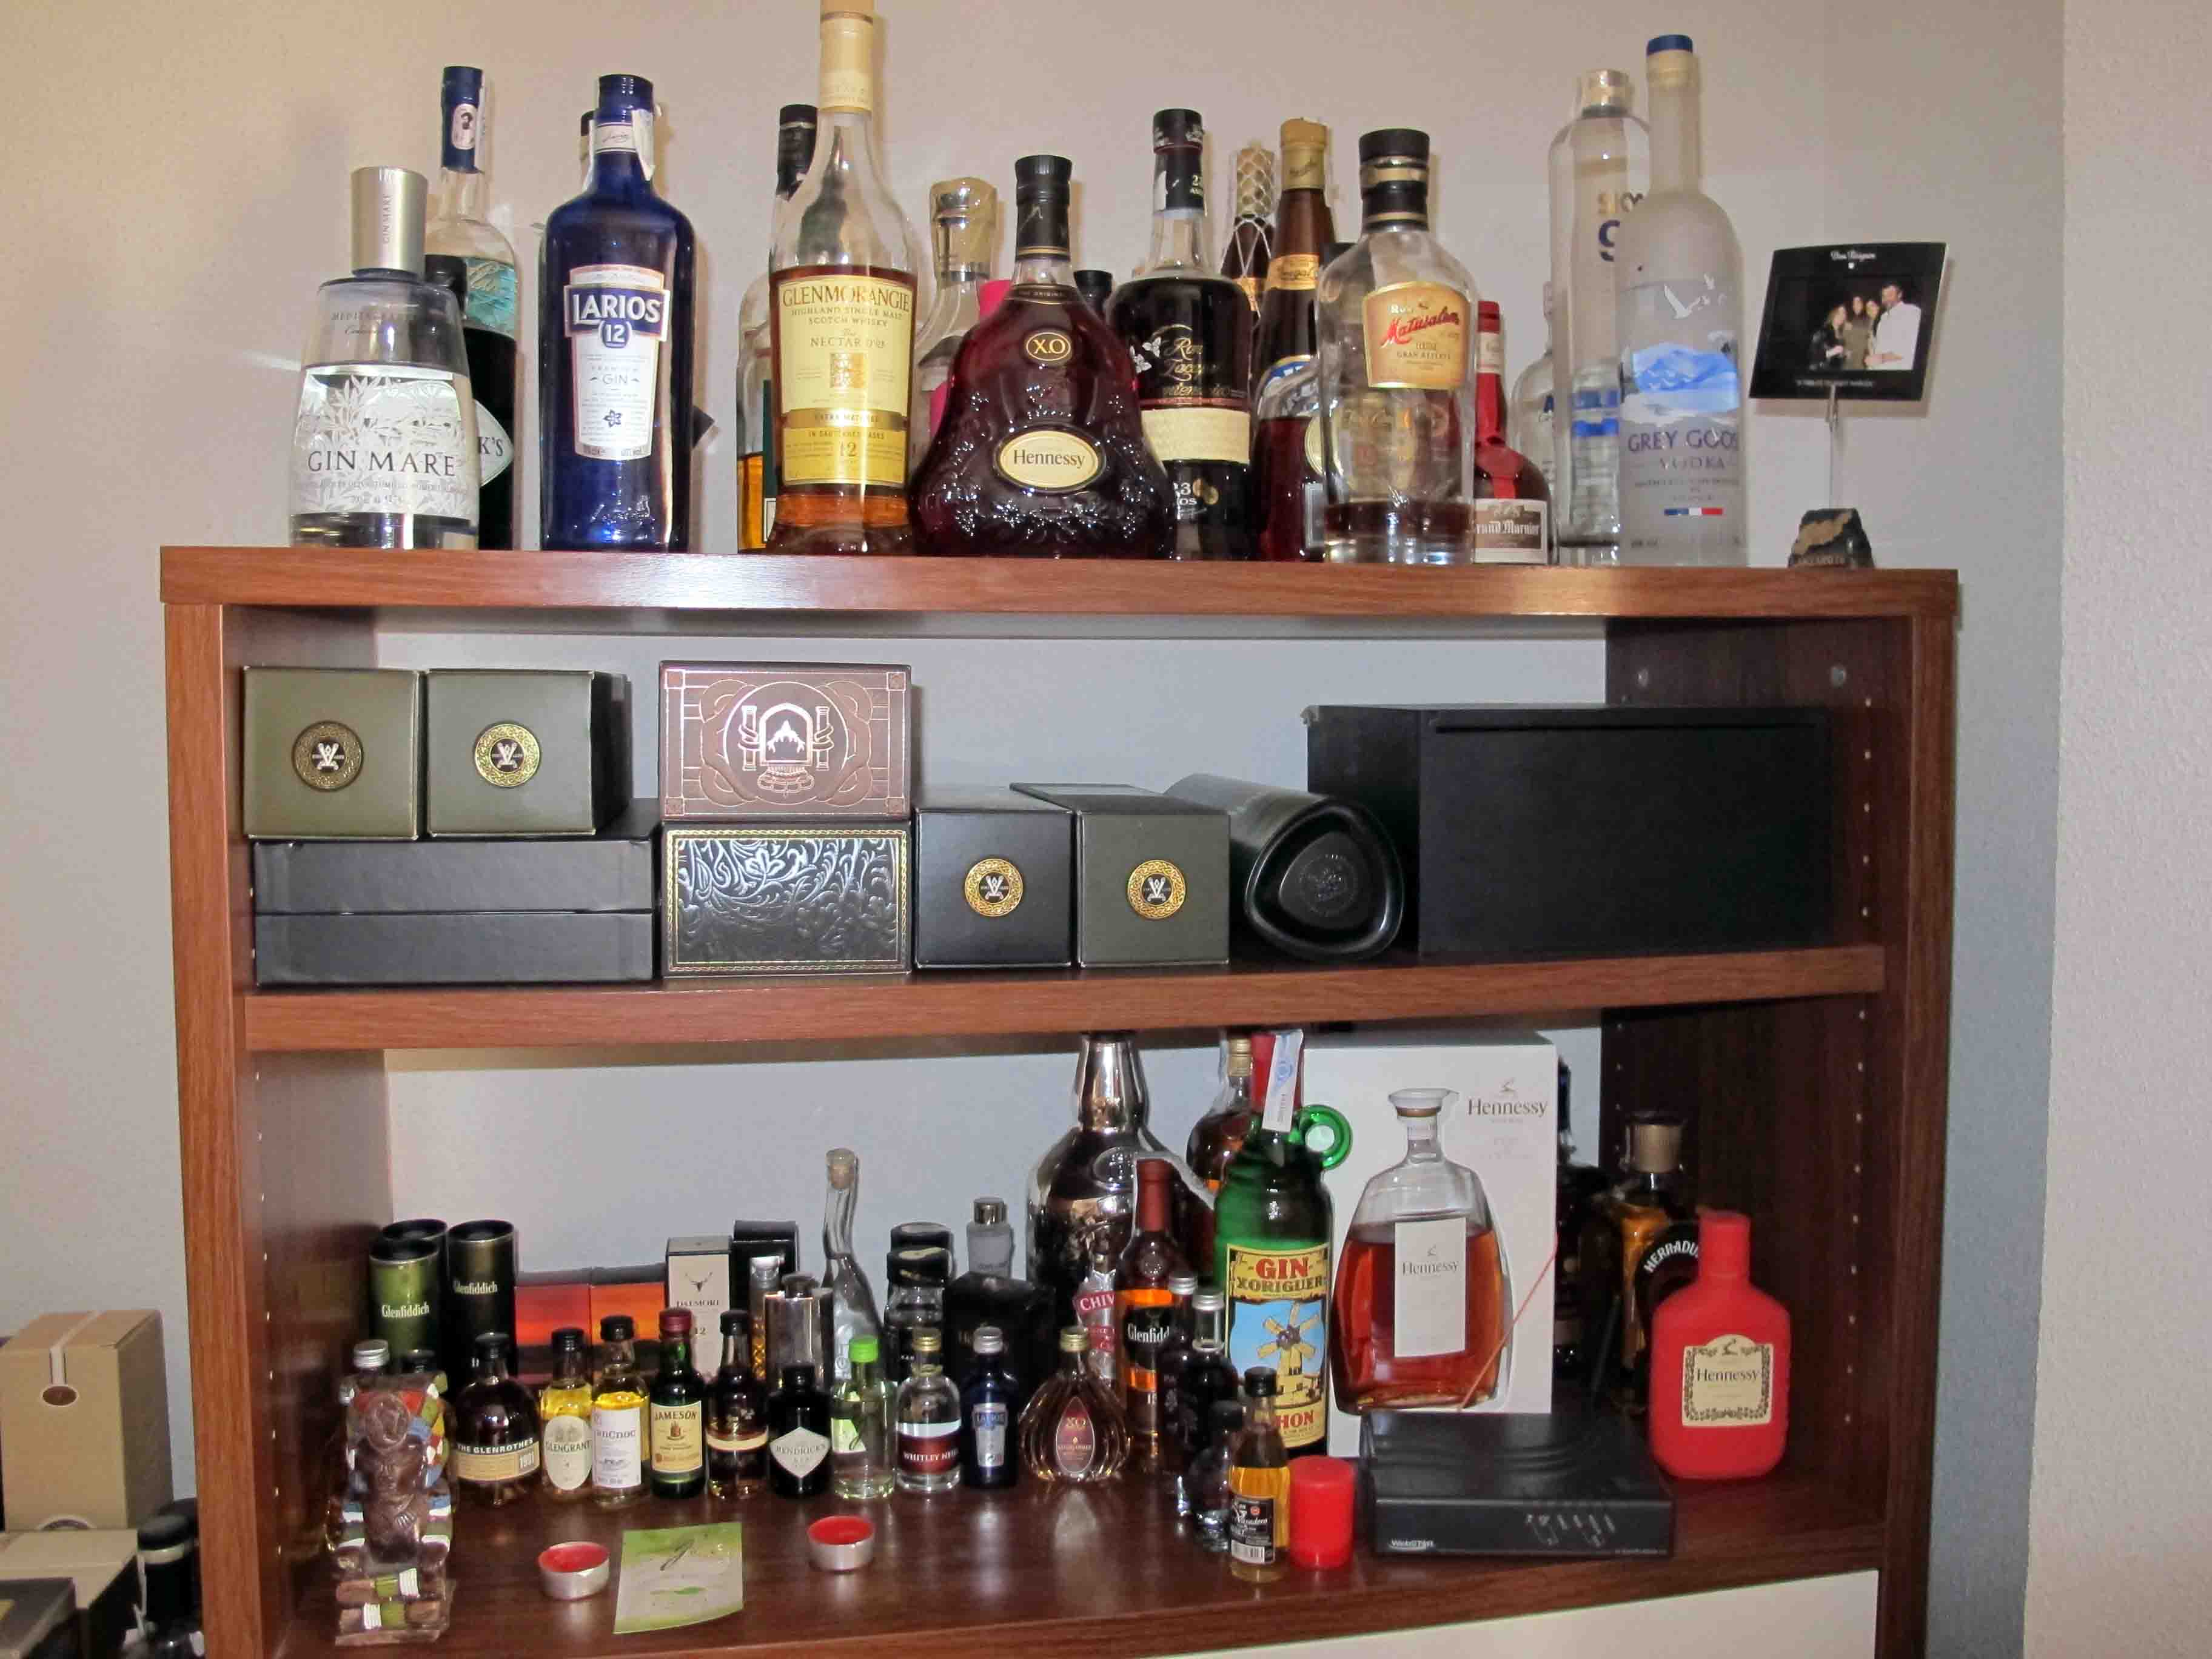 Muebles Para Guardar Whisky - Espirituosos Raquel Quida[mjhdah]http://walmartar.vteximg.com.br/arquivos/ids/814462-1000-1000/Whisky-Finest-Ballantines-1-Lt-1-29114.jpg?v=636427161257000000